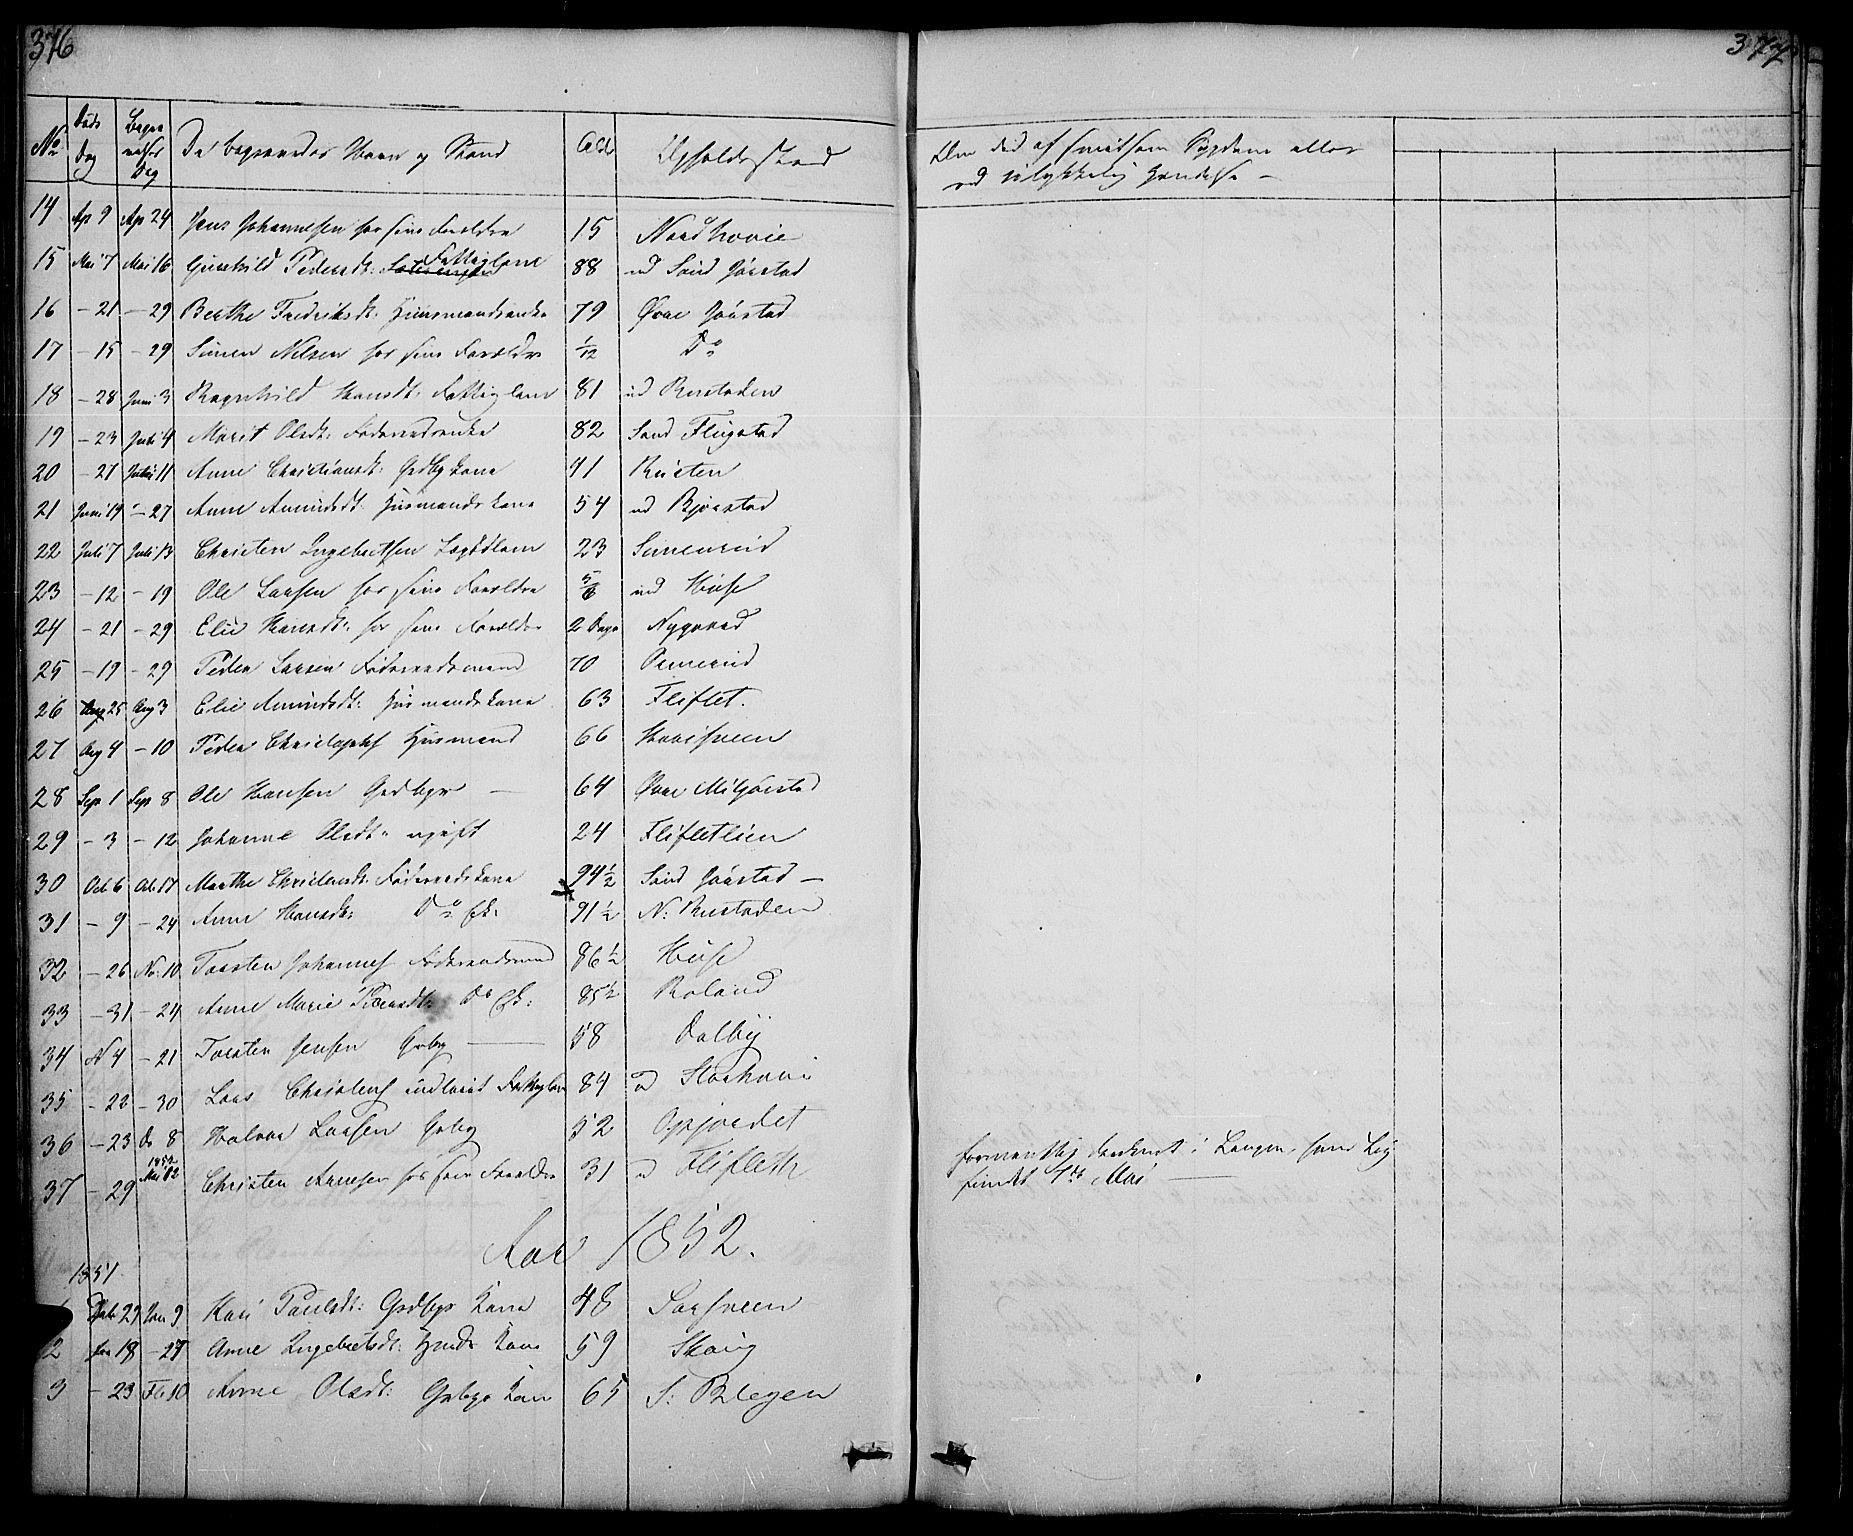 SAH, Fåberg prestekontor, Klokkerbok nr. 5, 1837-1864, s. 376-377